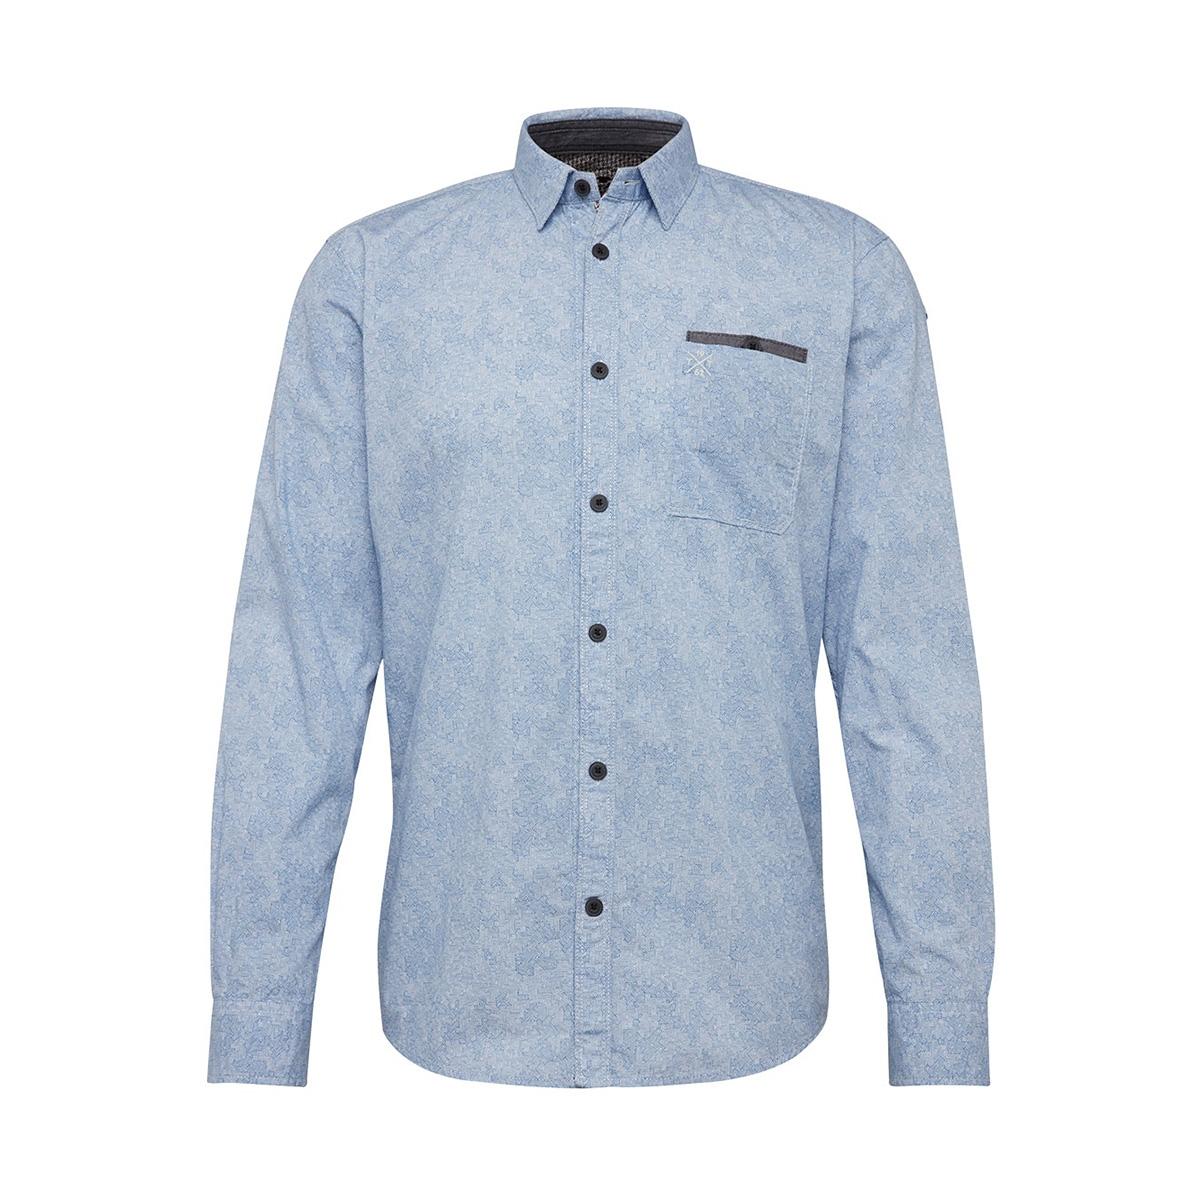 1006757xx10 tom tailor overhemd 14859